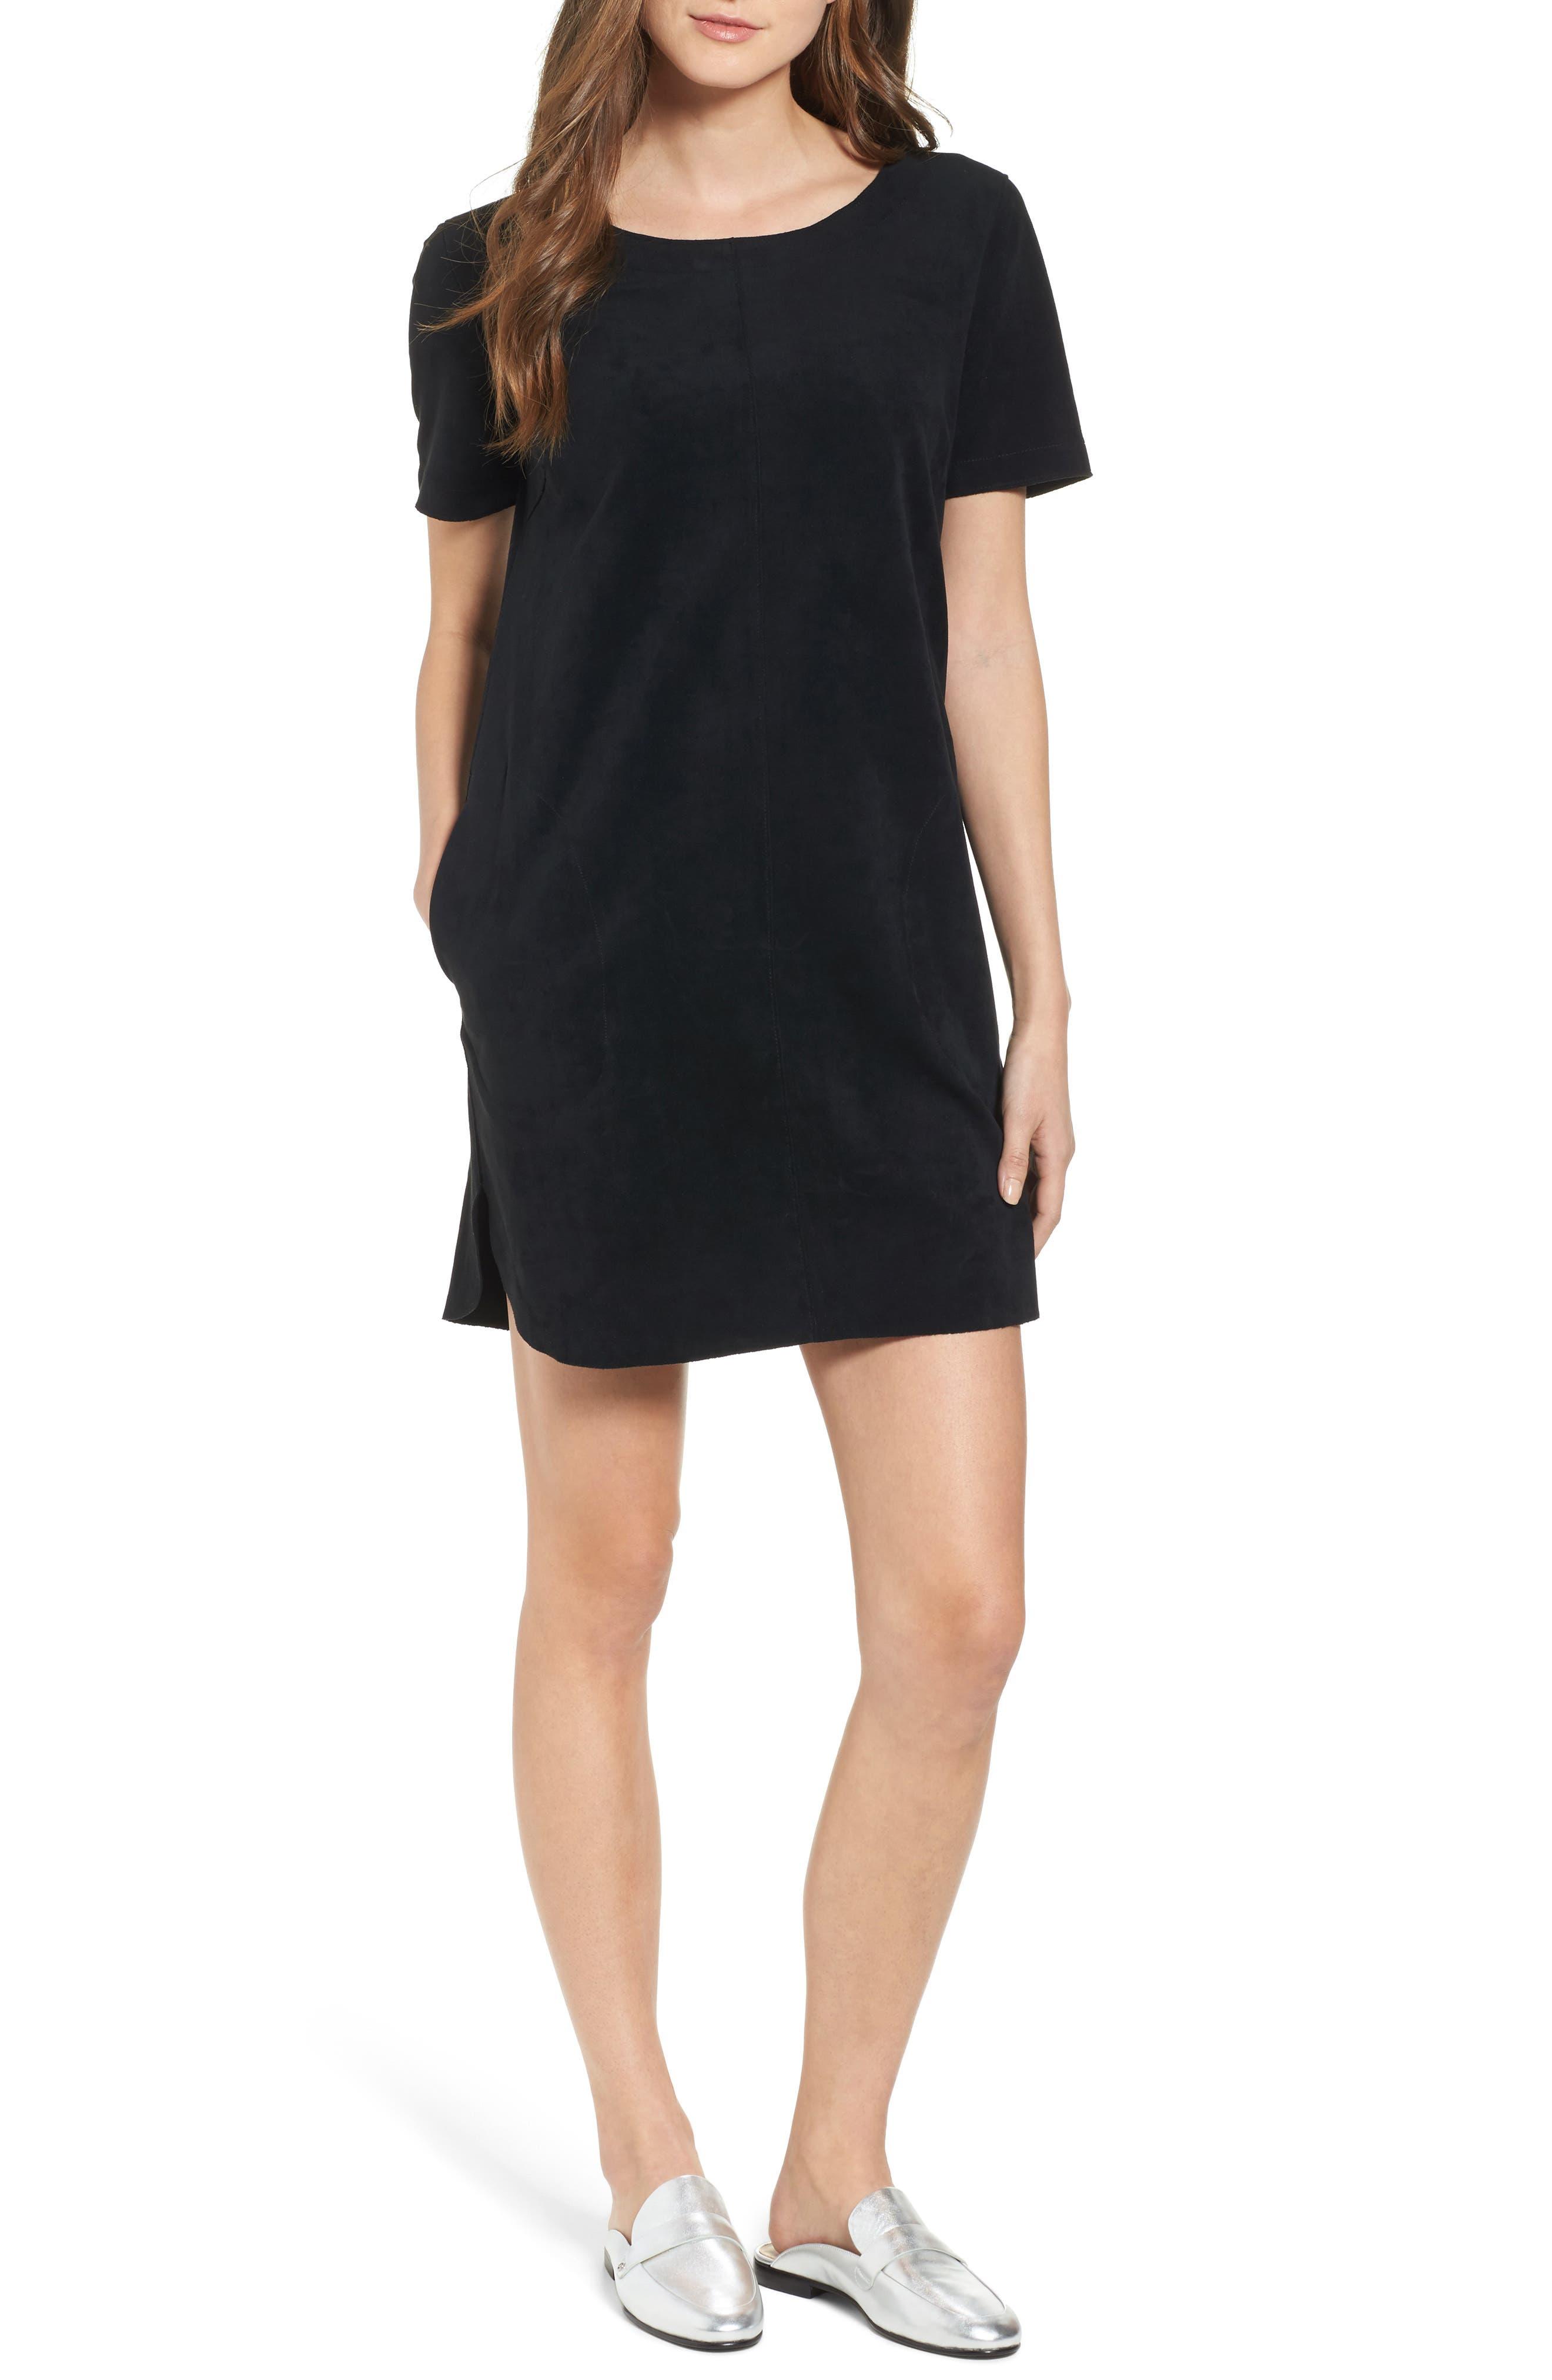 VELVET BY GRAHAM & SPENCER Faux Suede Dress, Main, color, 001